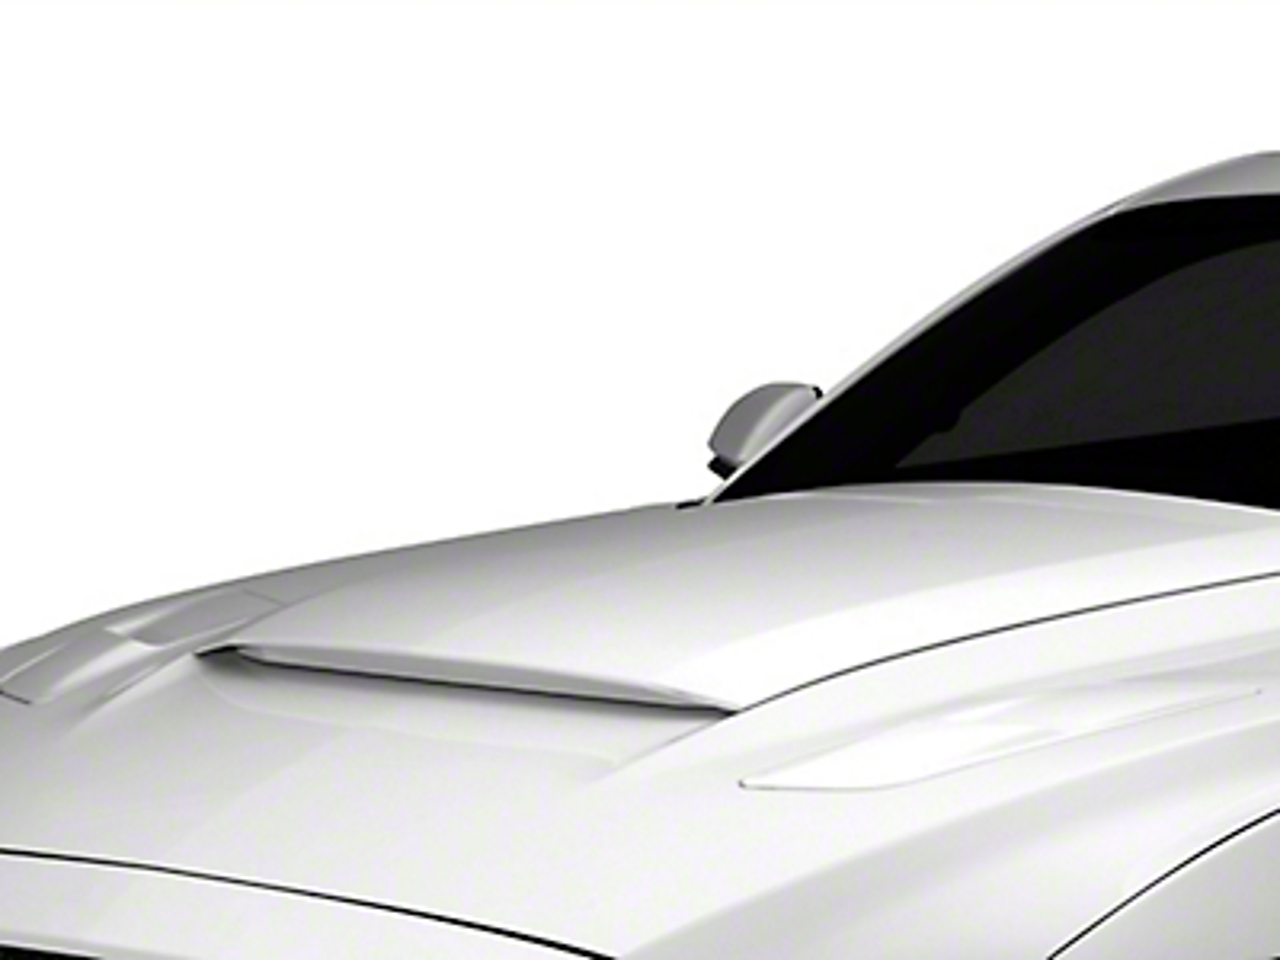 MMD V-Series Hood Scoop - Unpainted (15-17 GT, EcoBoost, V6)